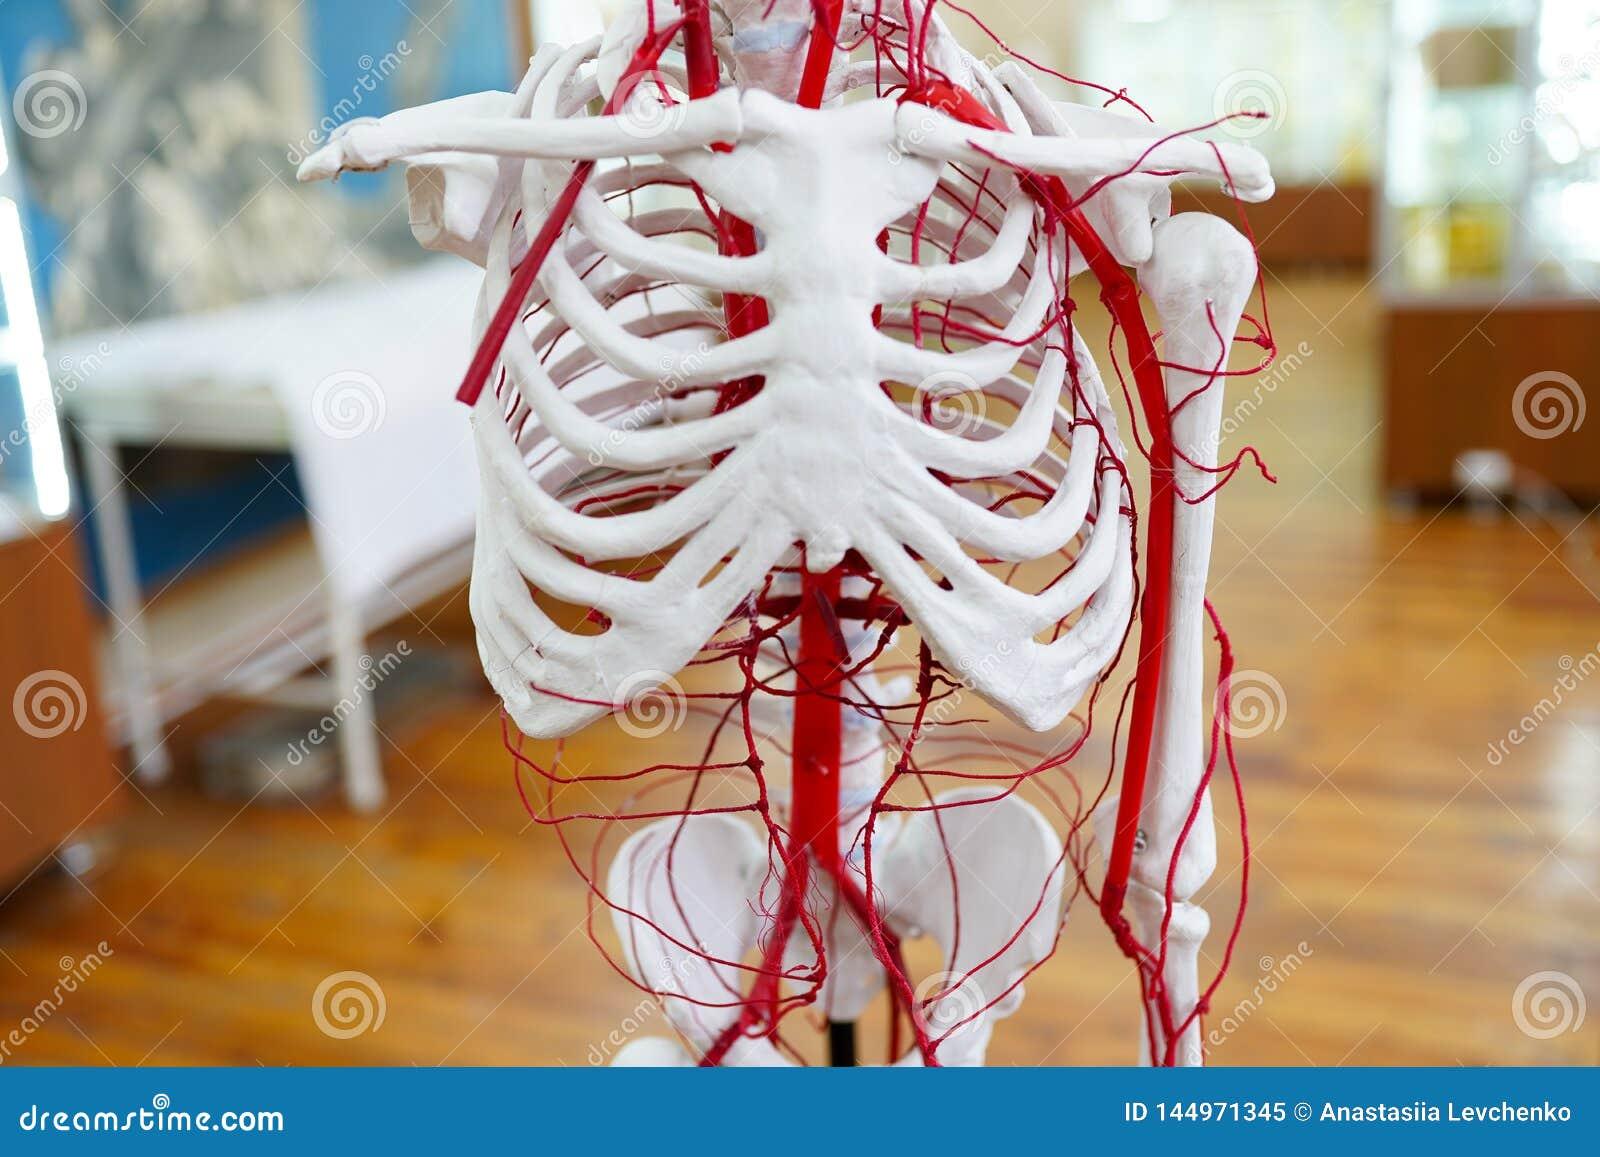 Circulatory system human anatomy skeleton